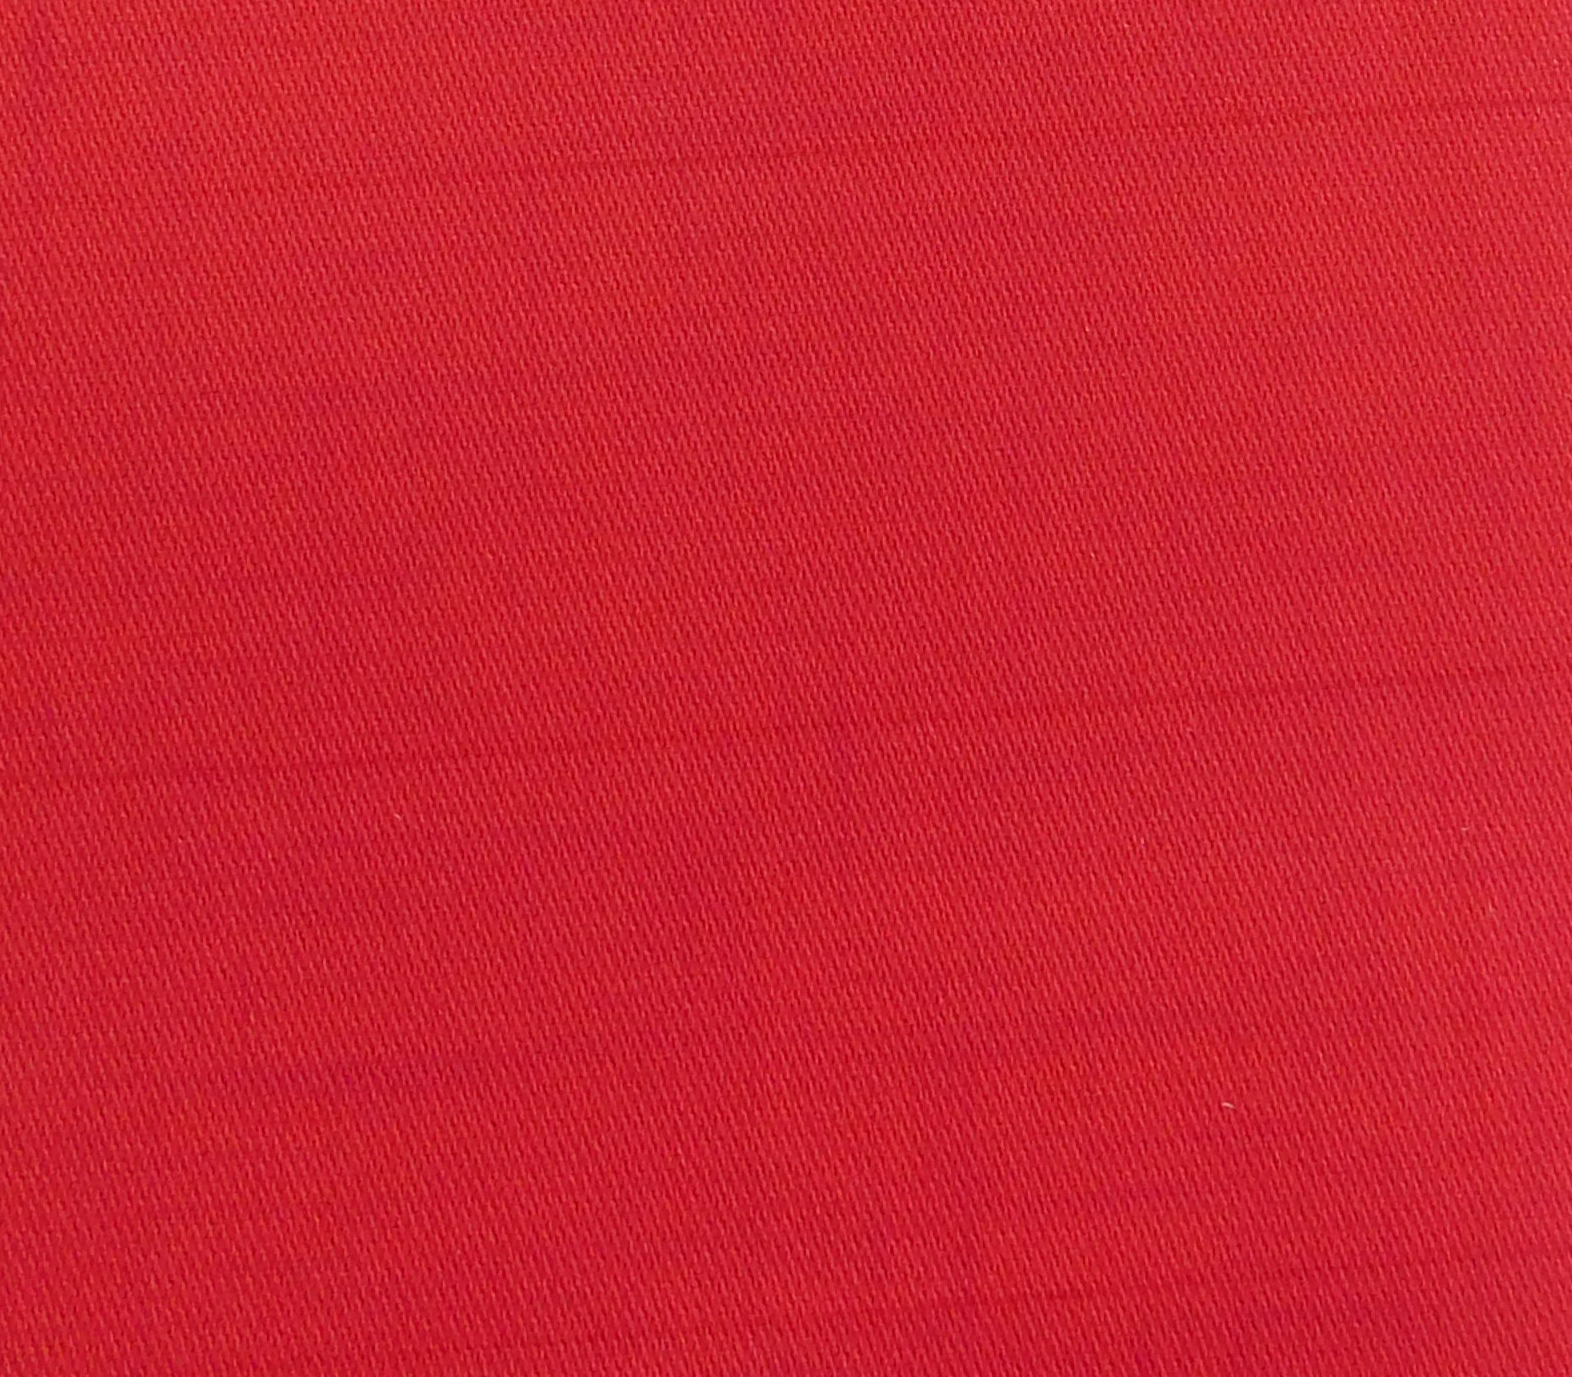 Spectrum Firecracker Blind Sample Fabric